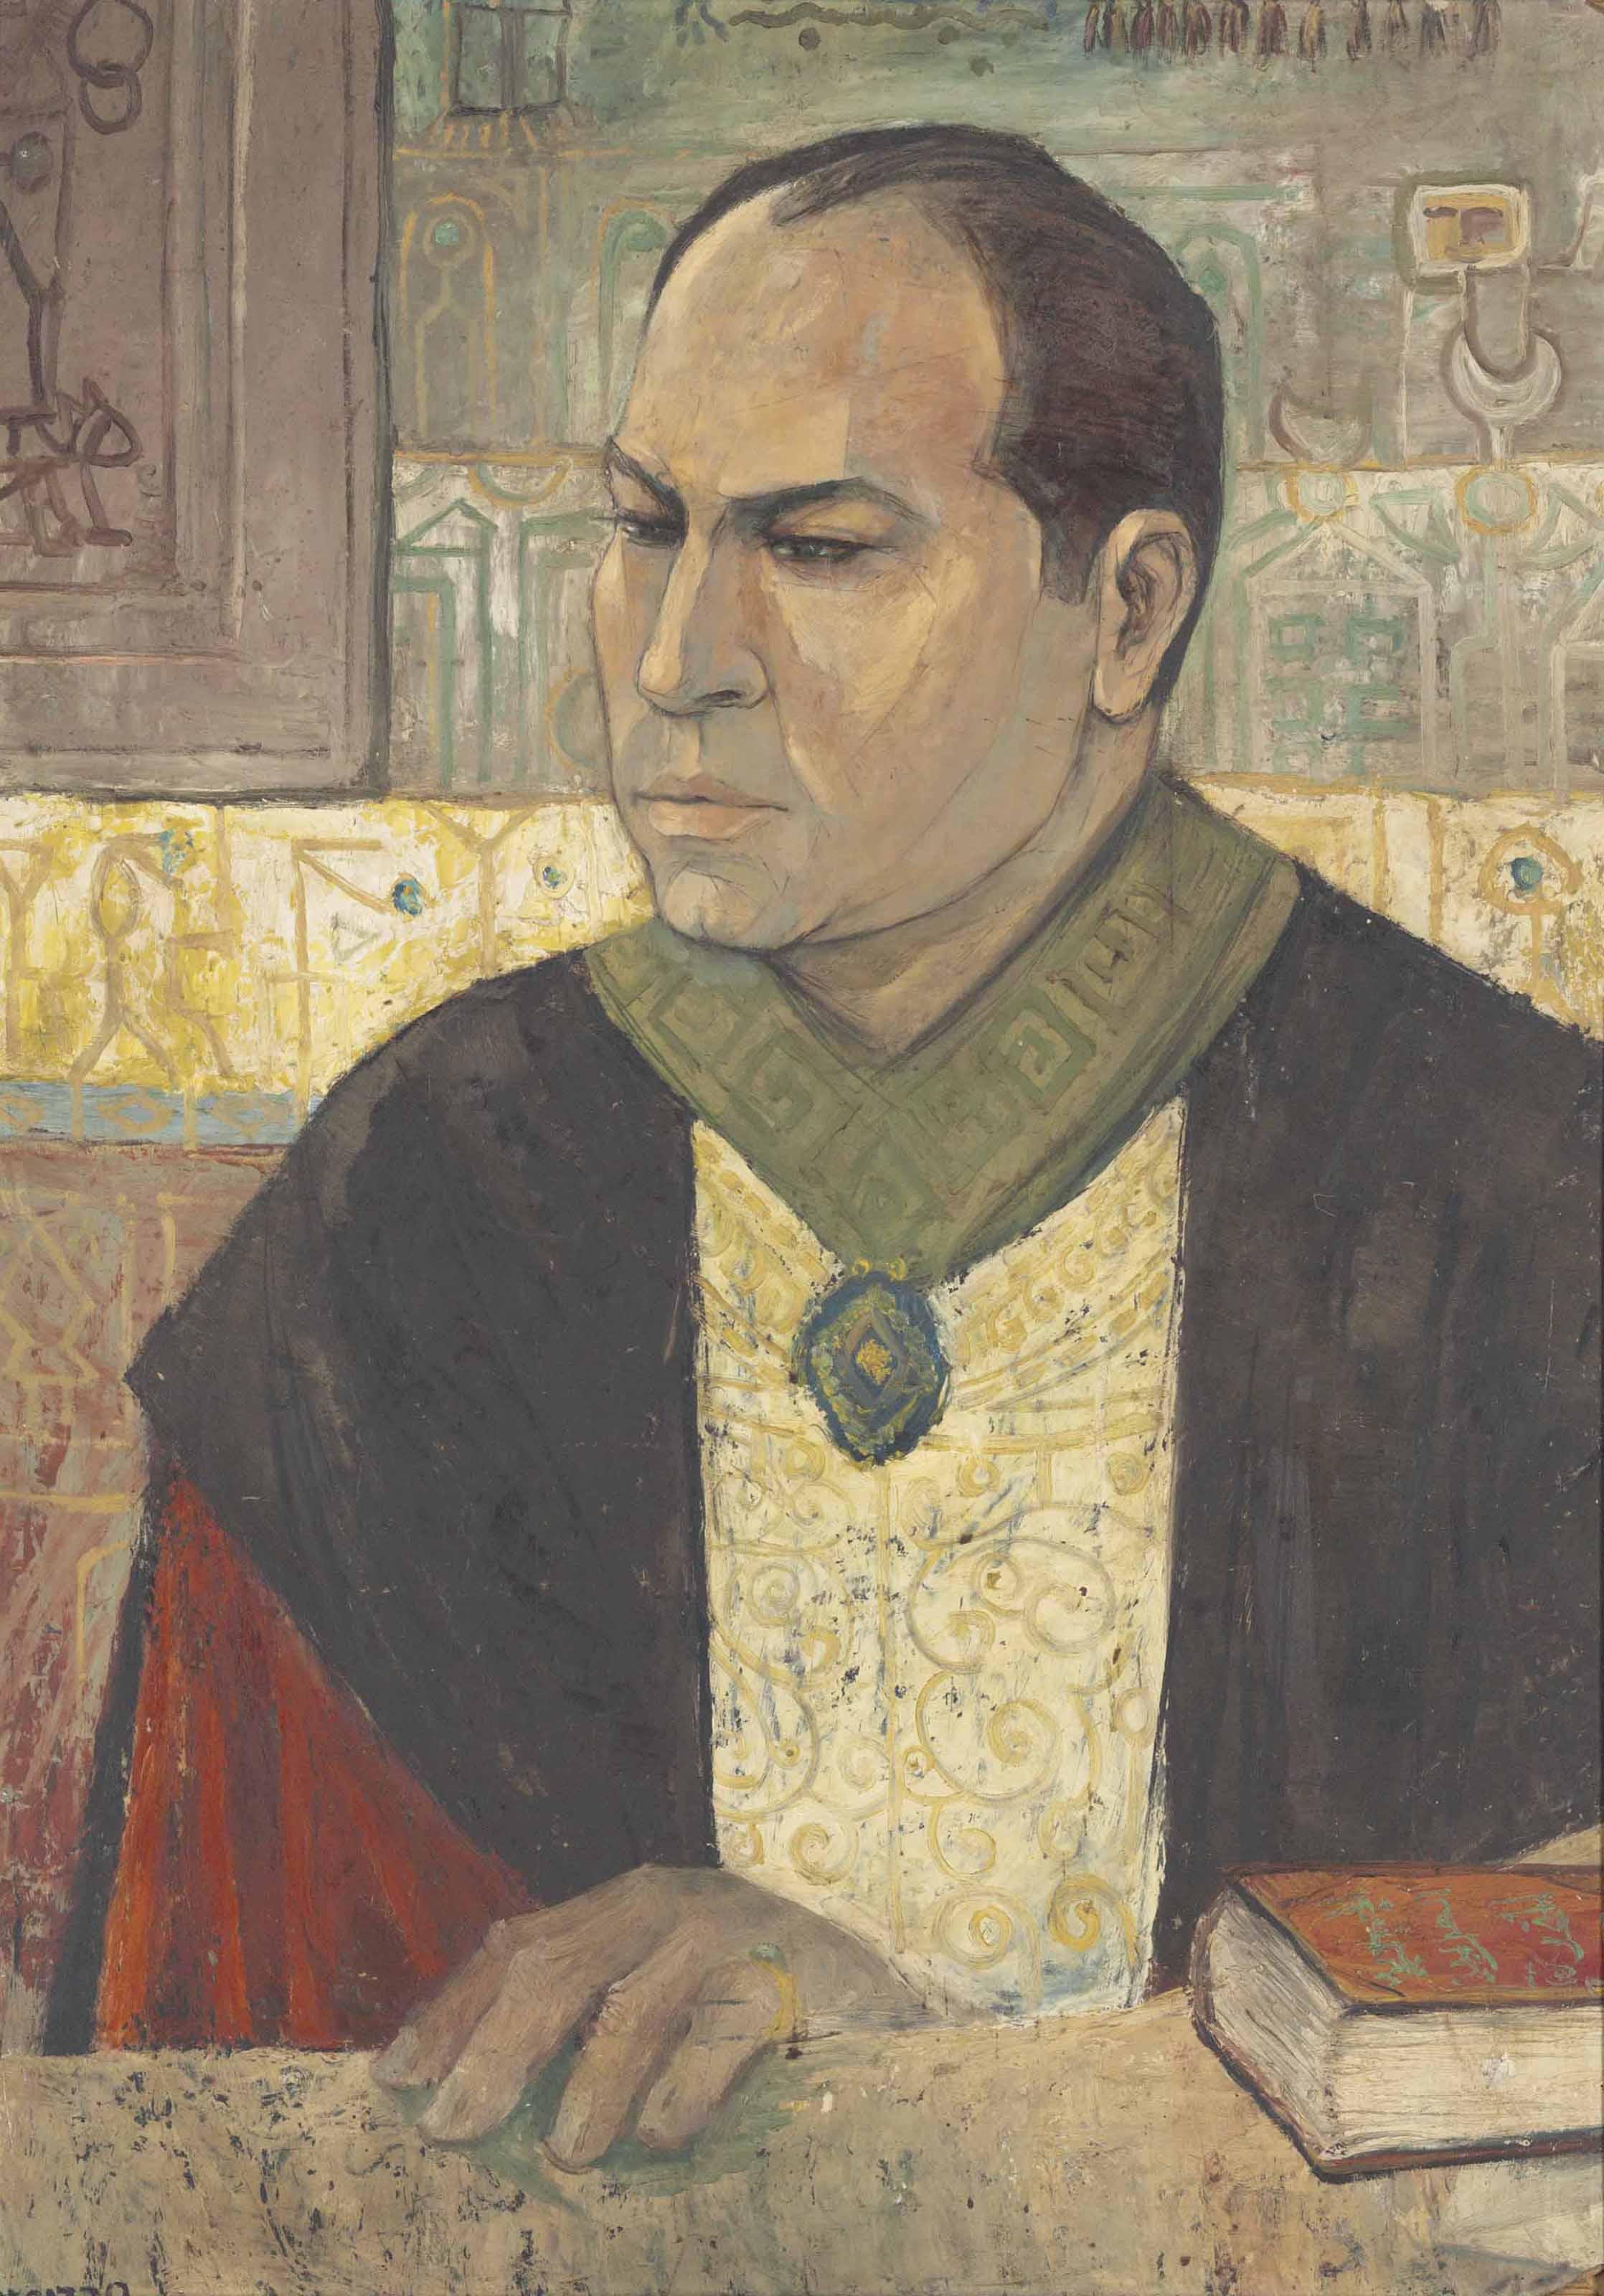 Portrait of Salah Youssef Kamel